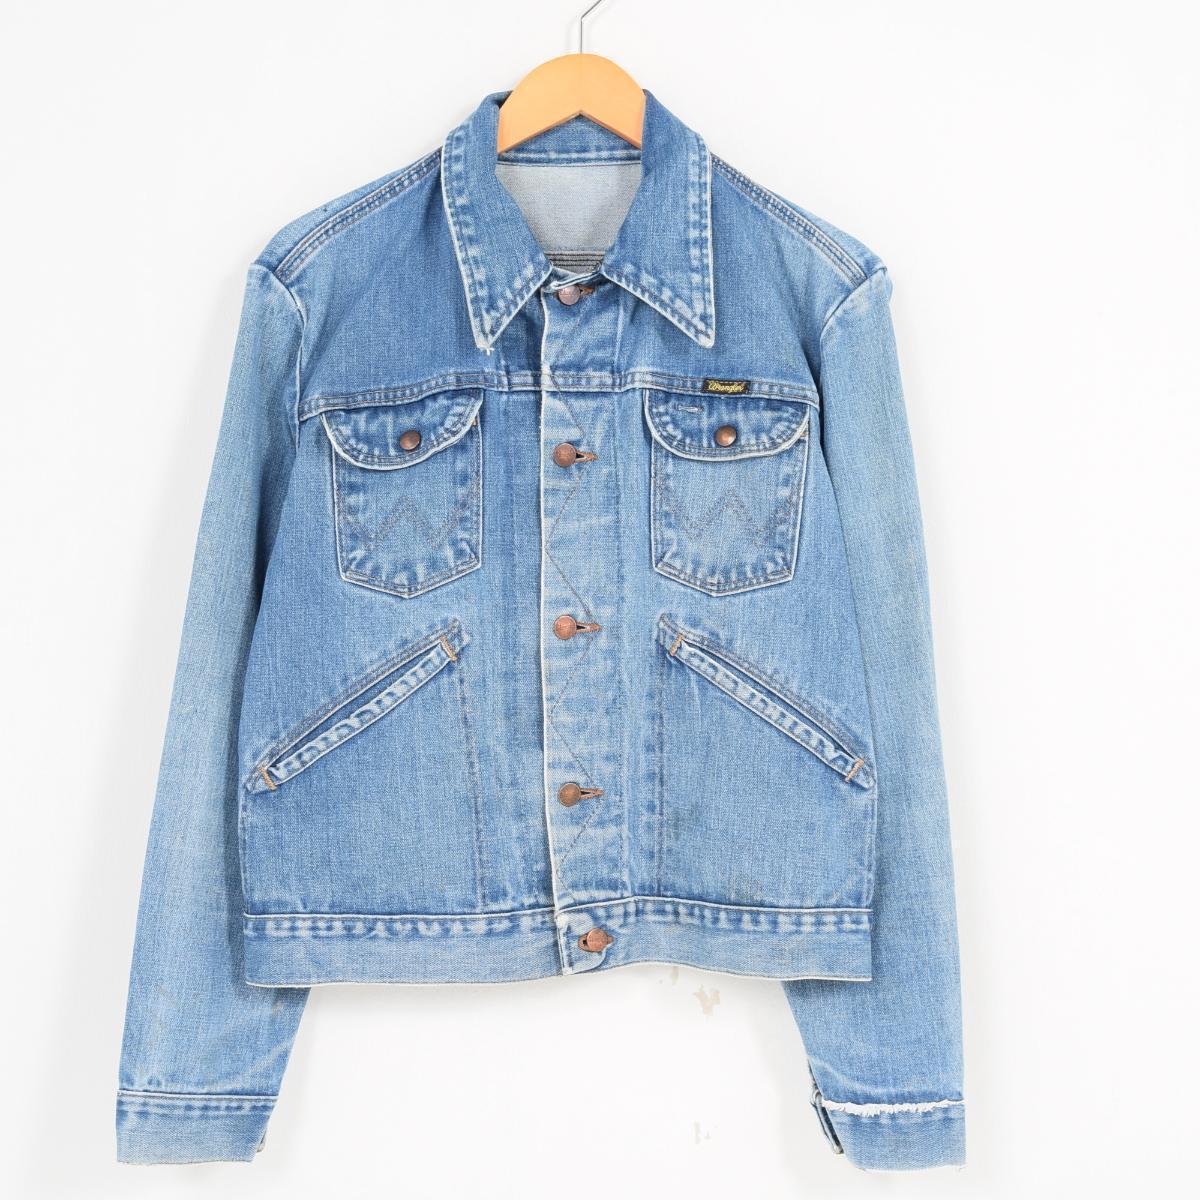 Denim Jacket Jam Back Vintage Clothing Paint G Wrangler qgYXnHwxn1